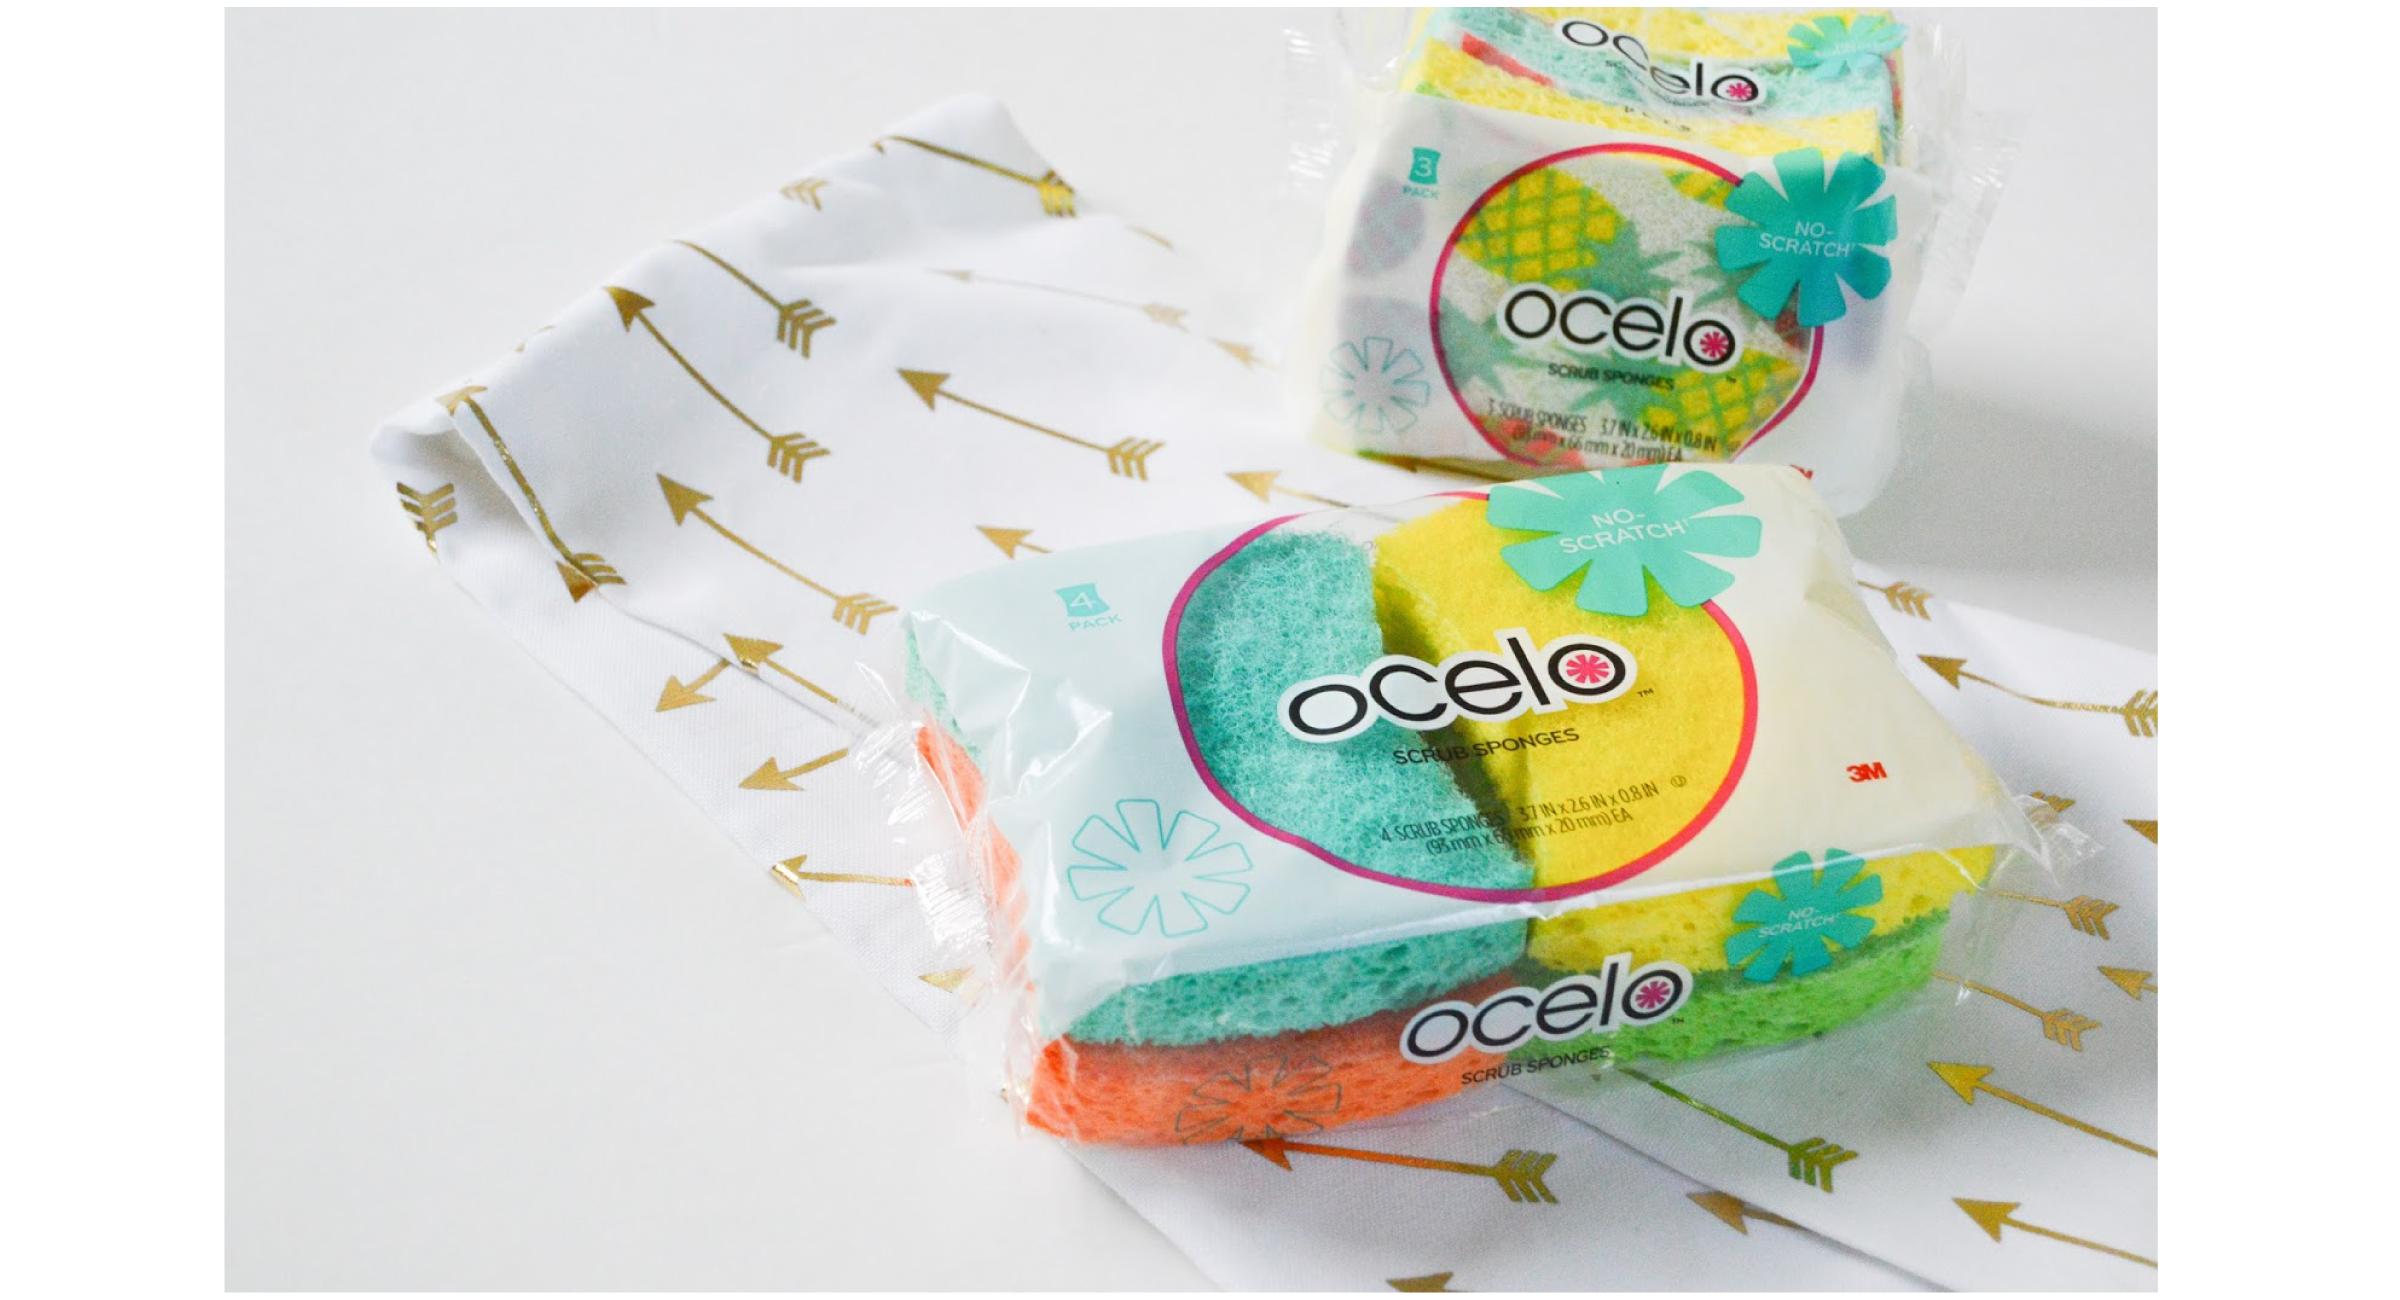 3M Ocelo Product Design